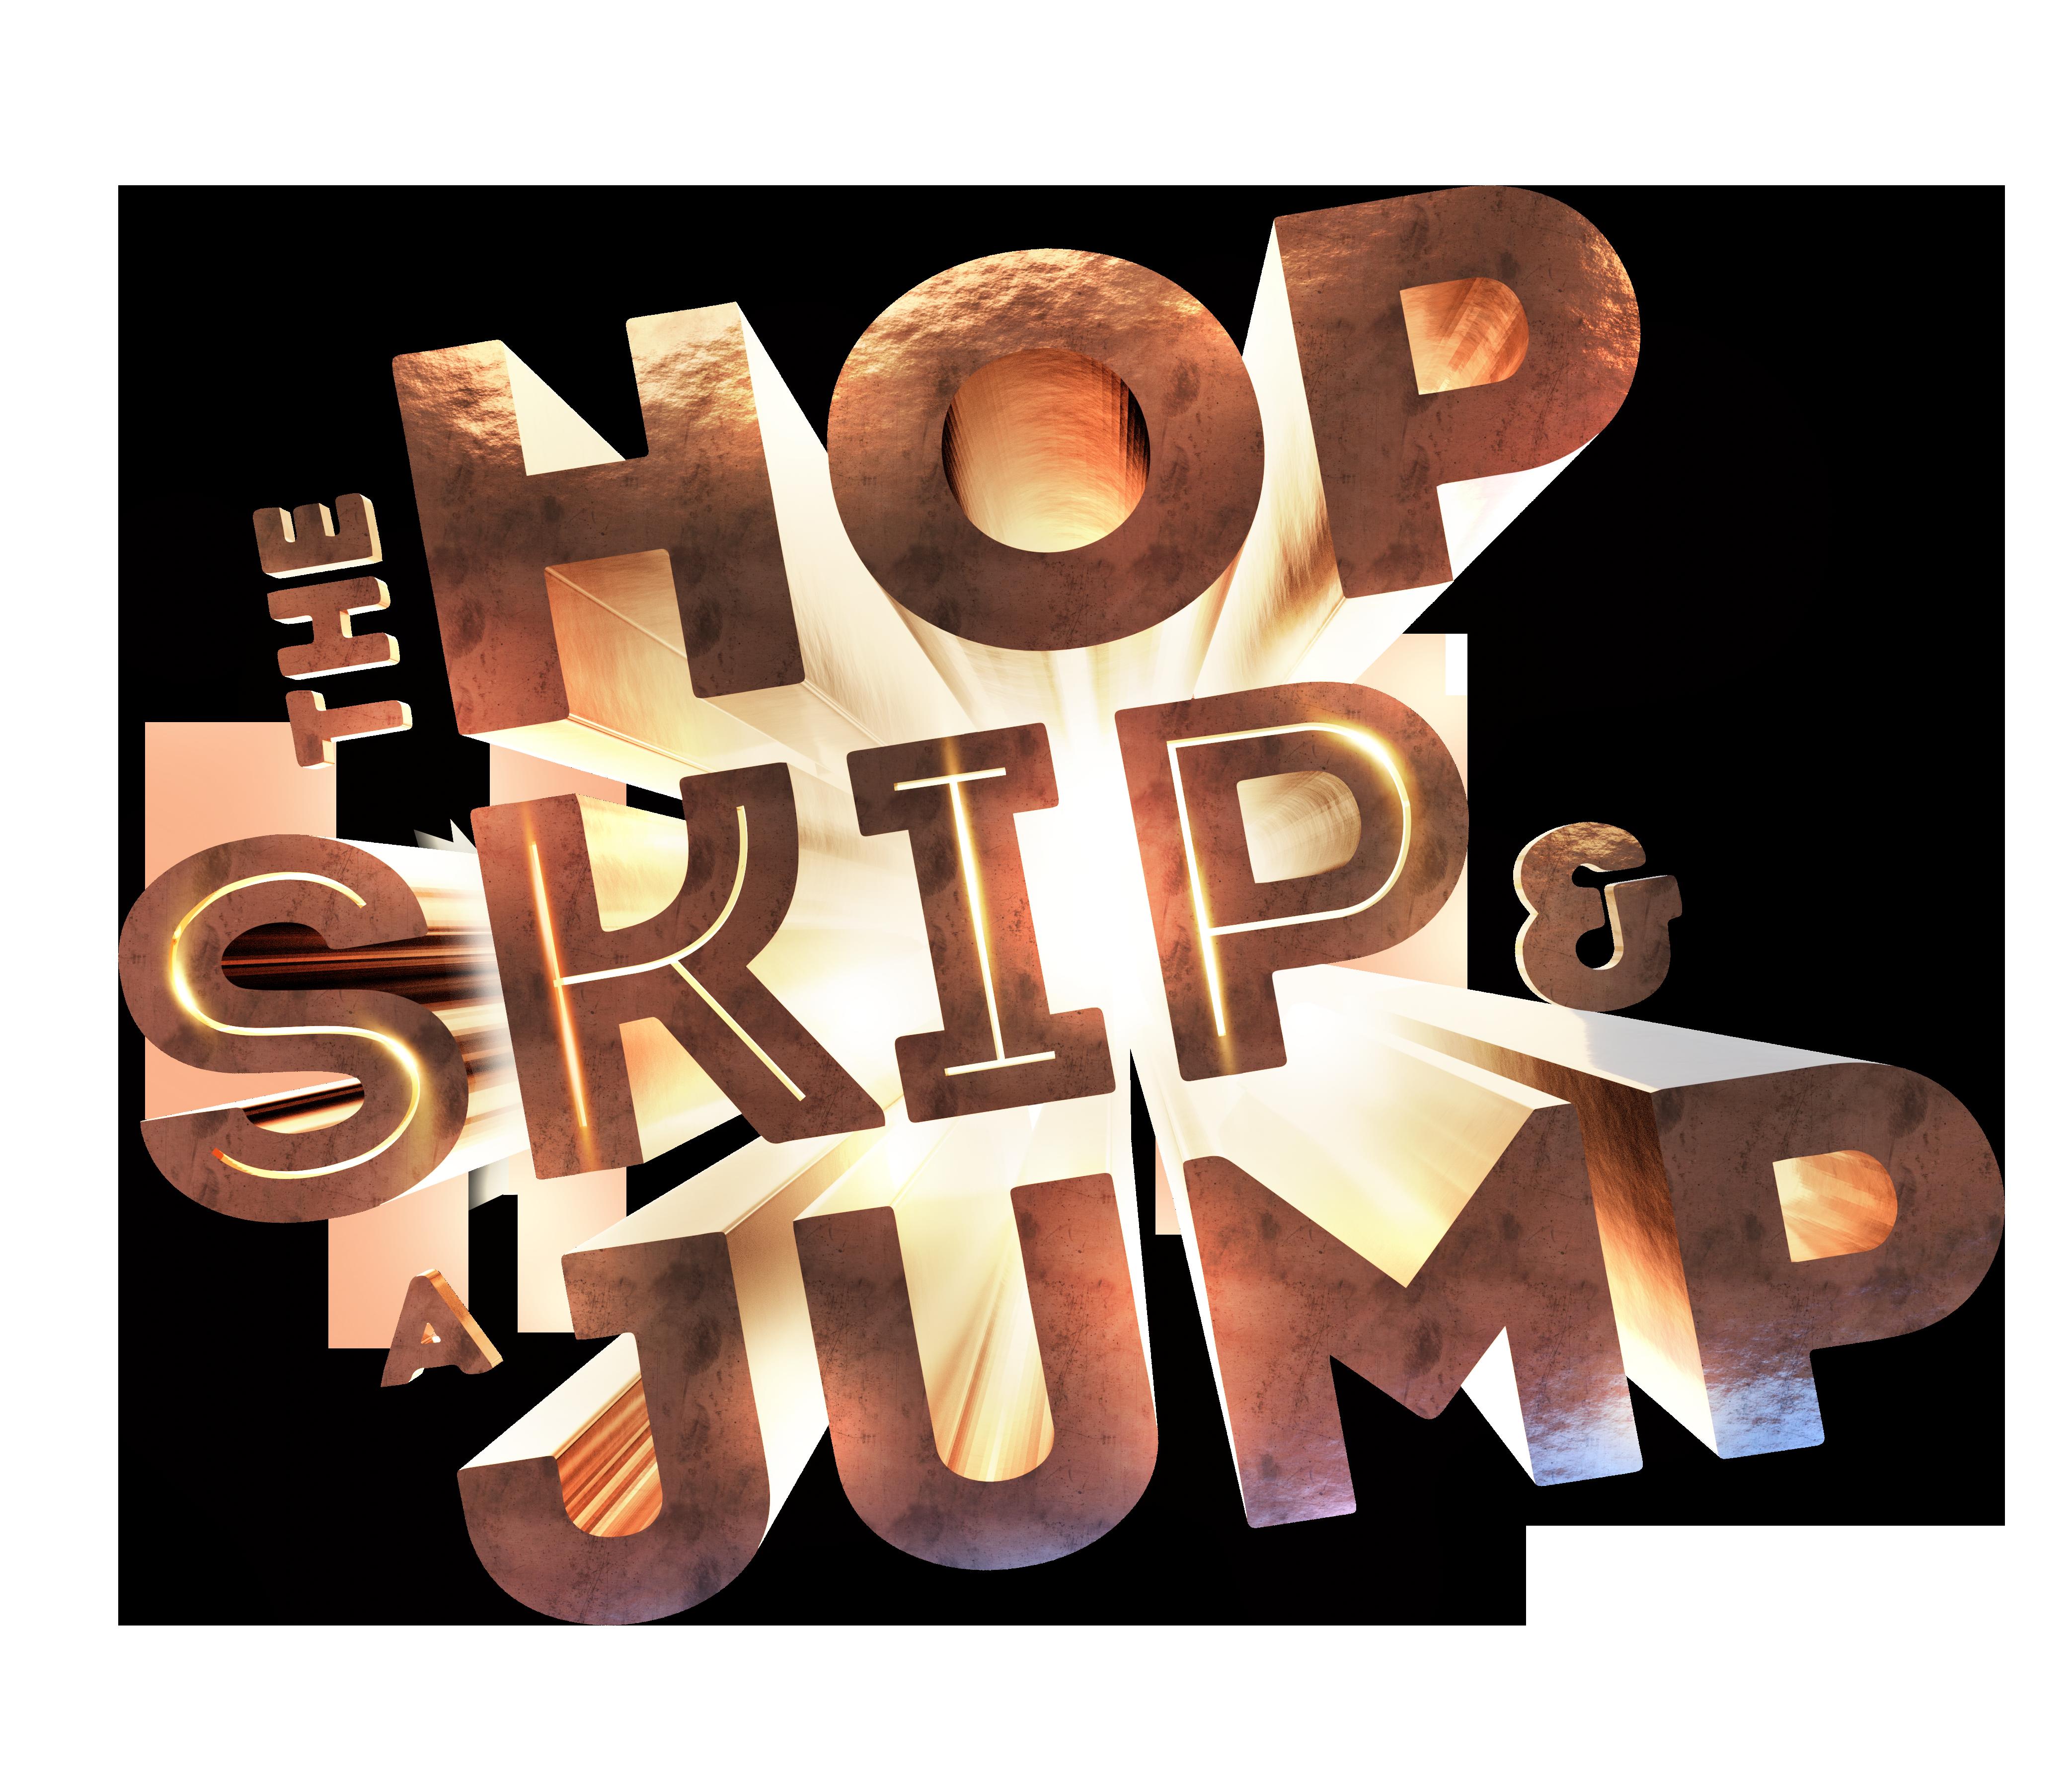 hopskipjump_logo